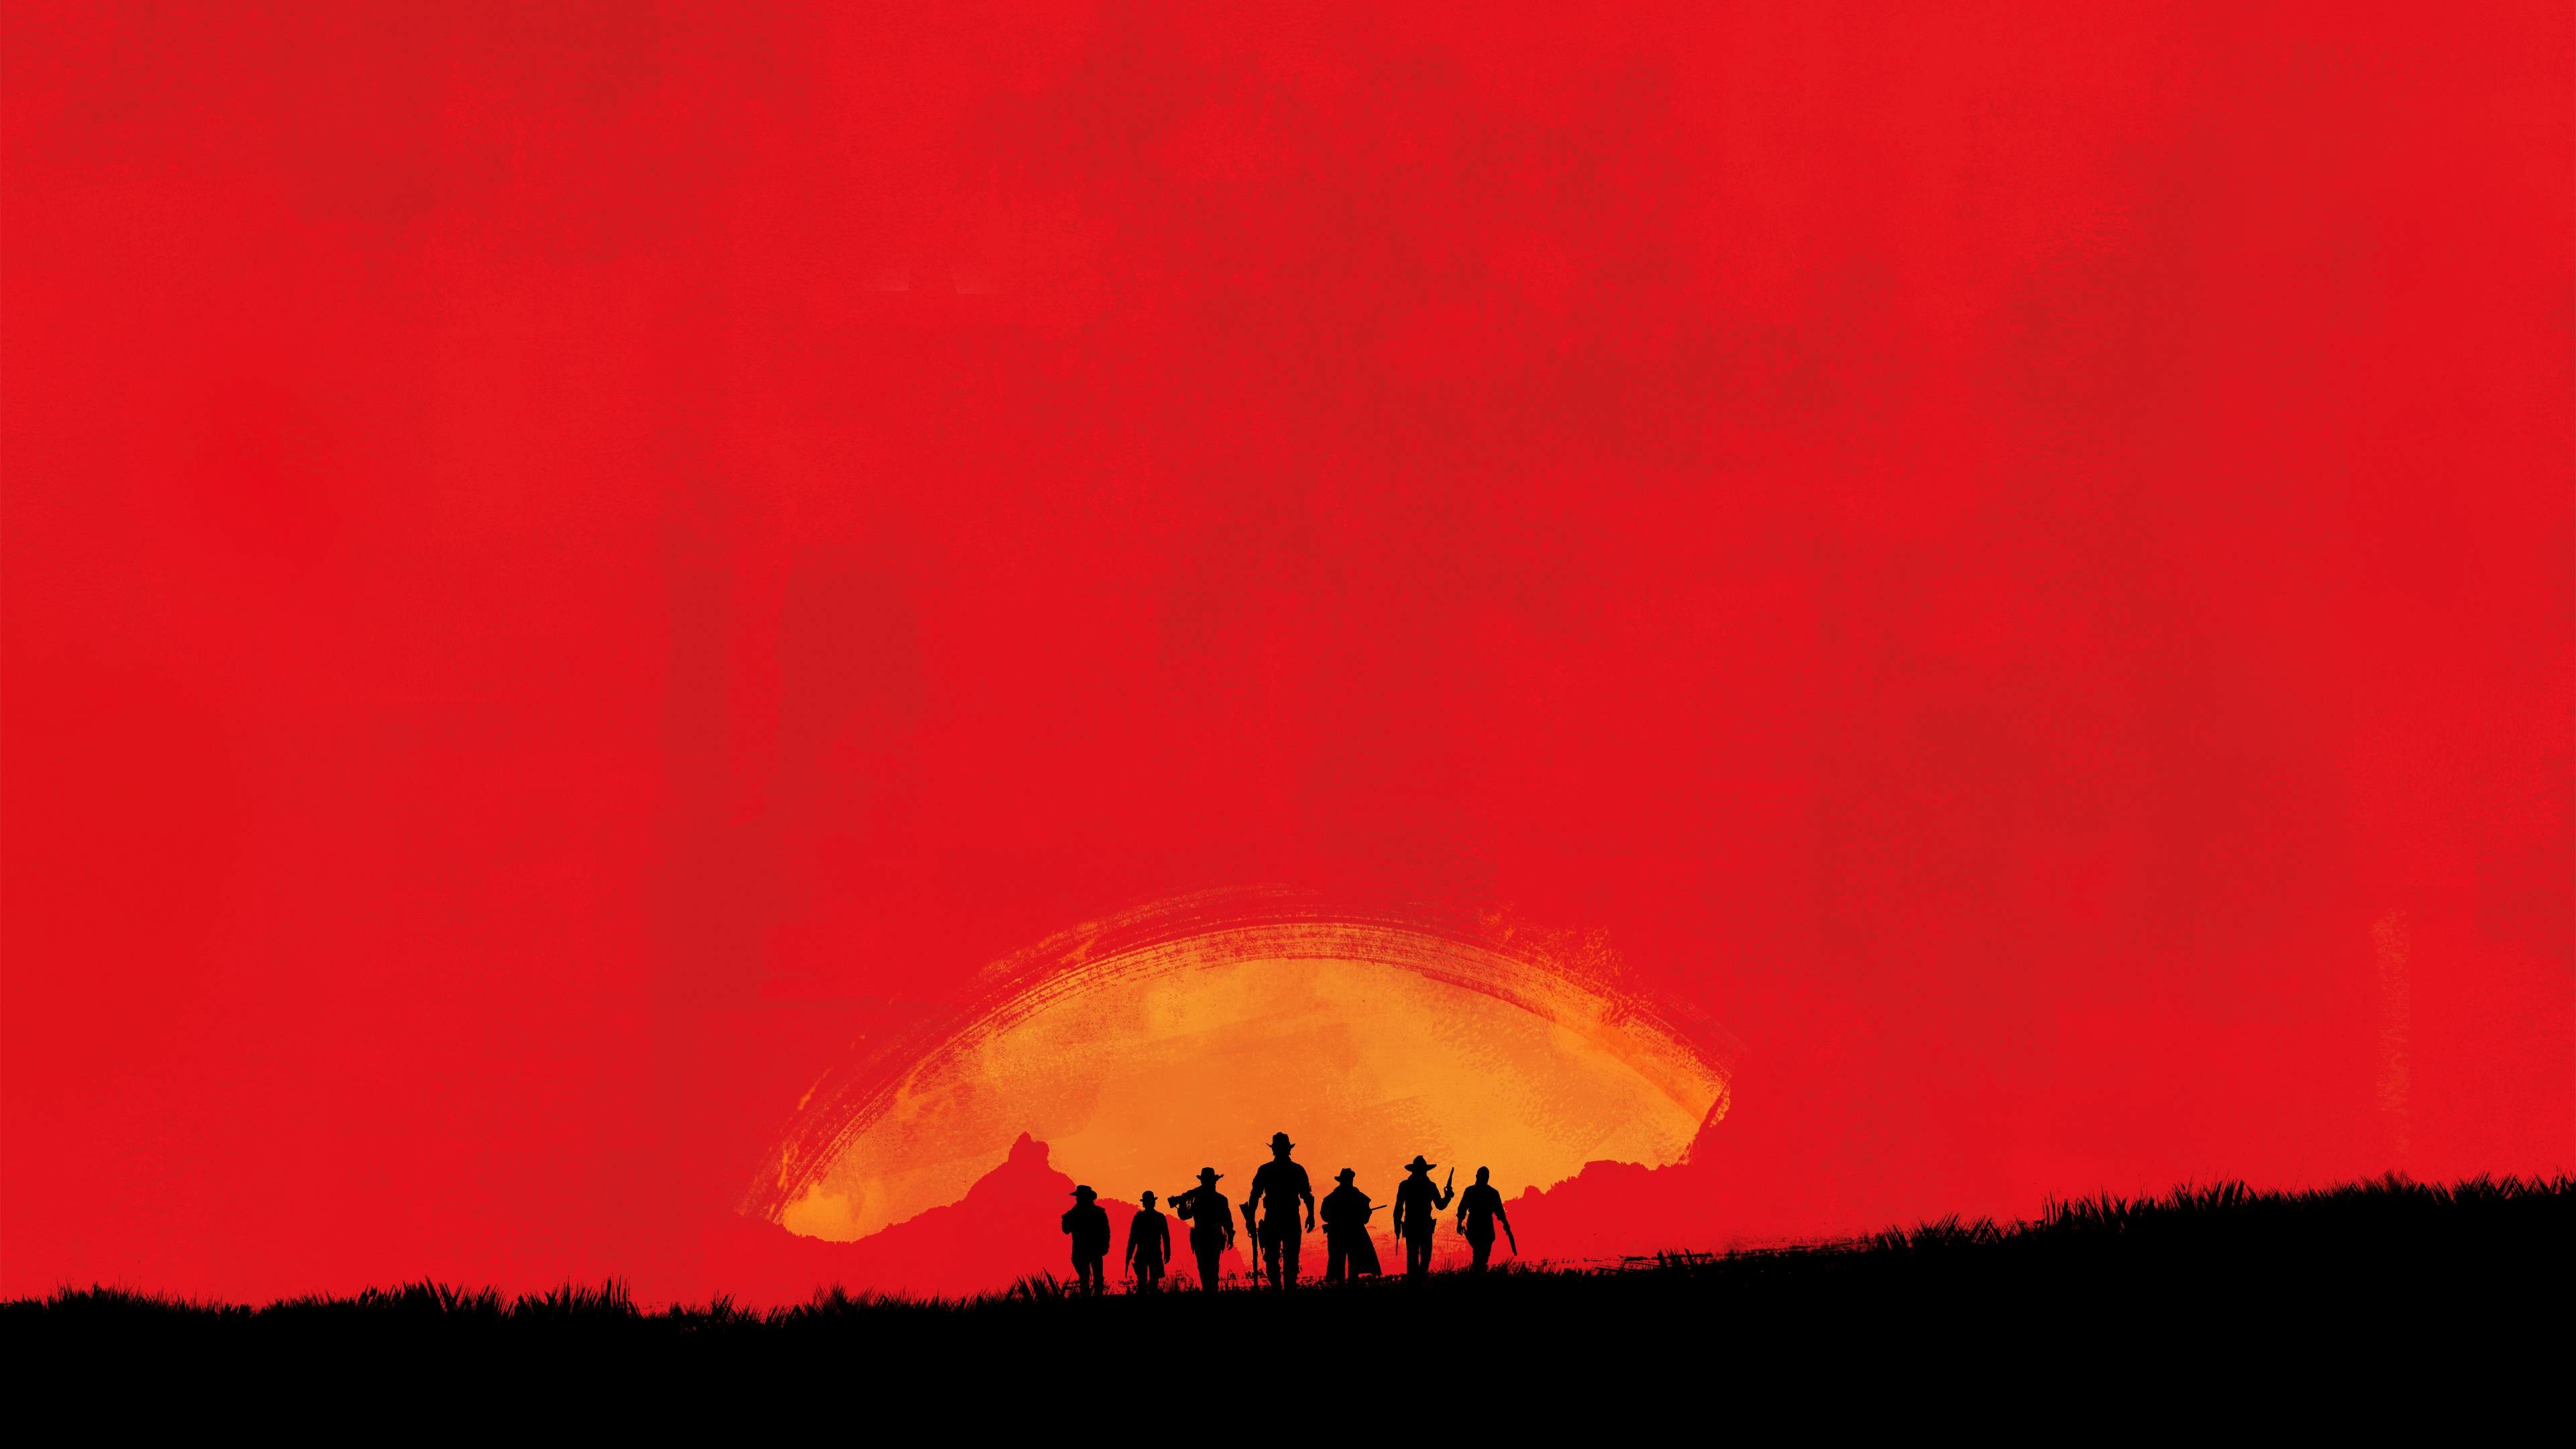 Red Dead 3 (4K Wallpaper) …